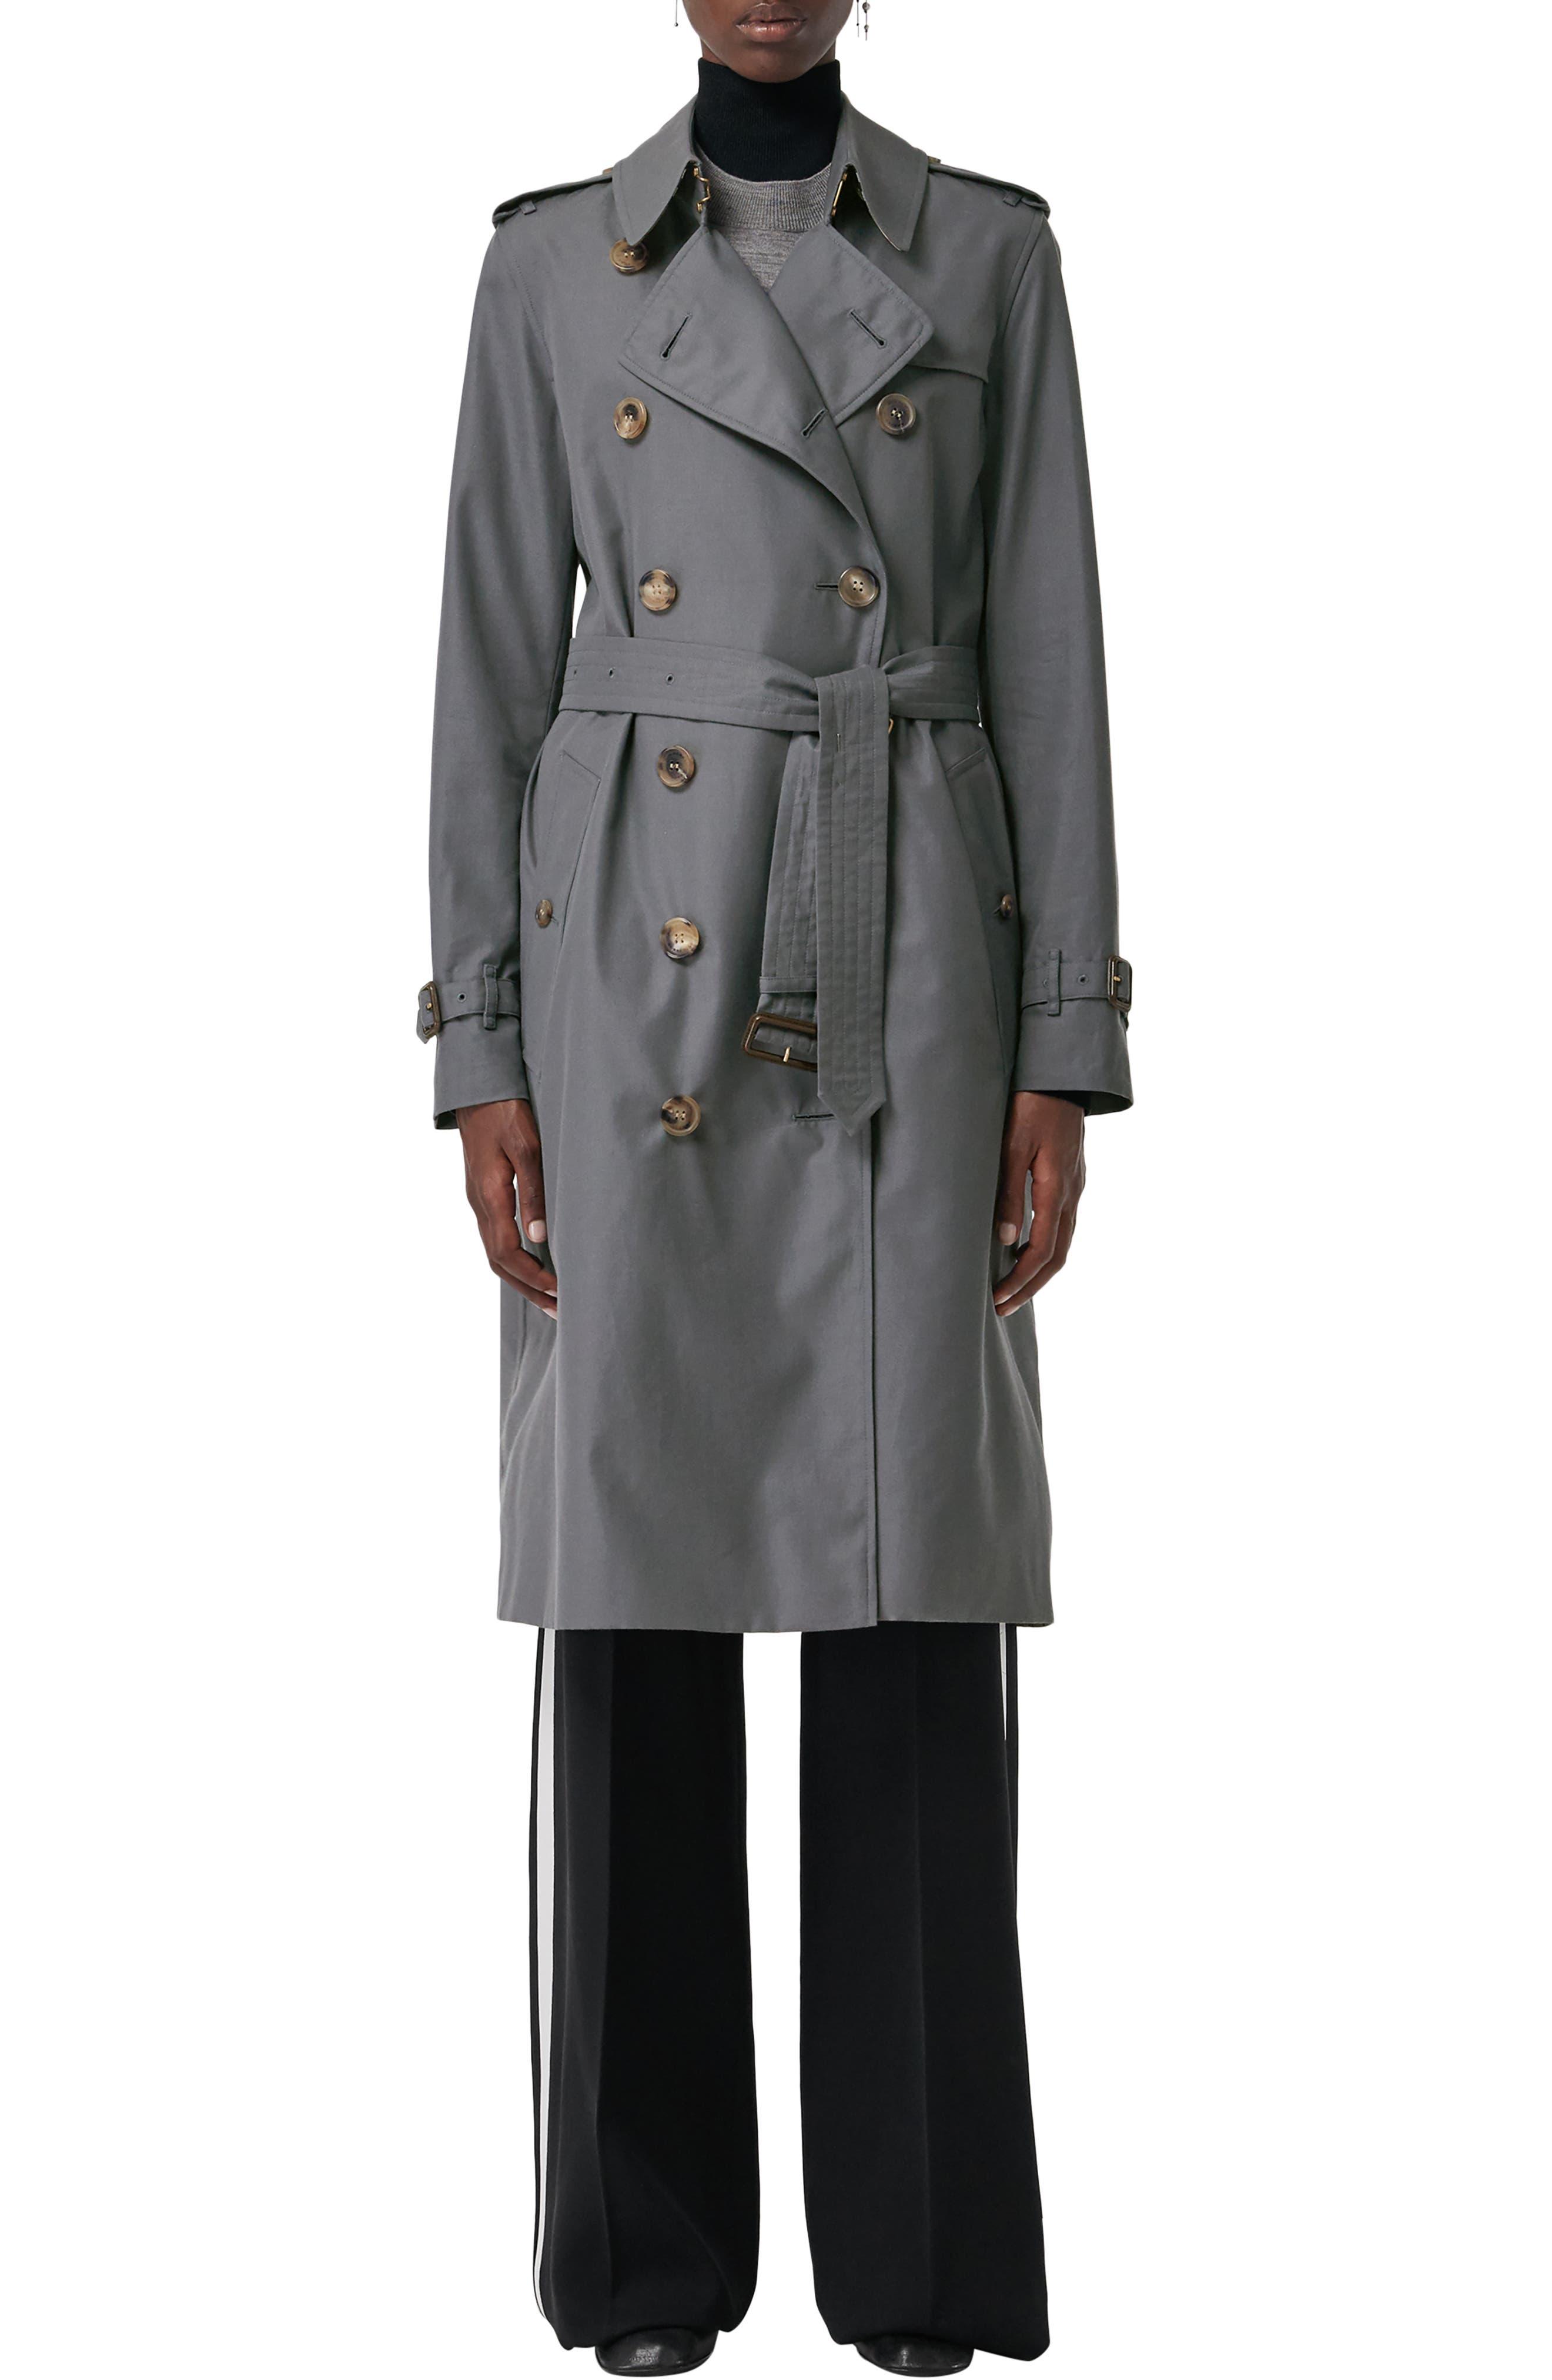 BURBERRY, Kensington Long Heritage Trench Coat, Main thumbnail 1, color, MID GREY